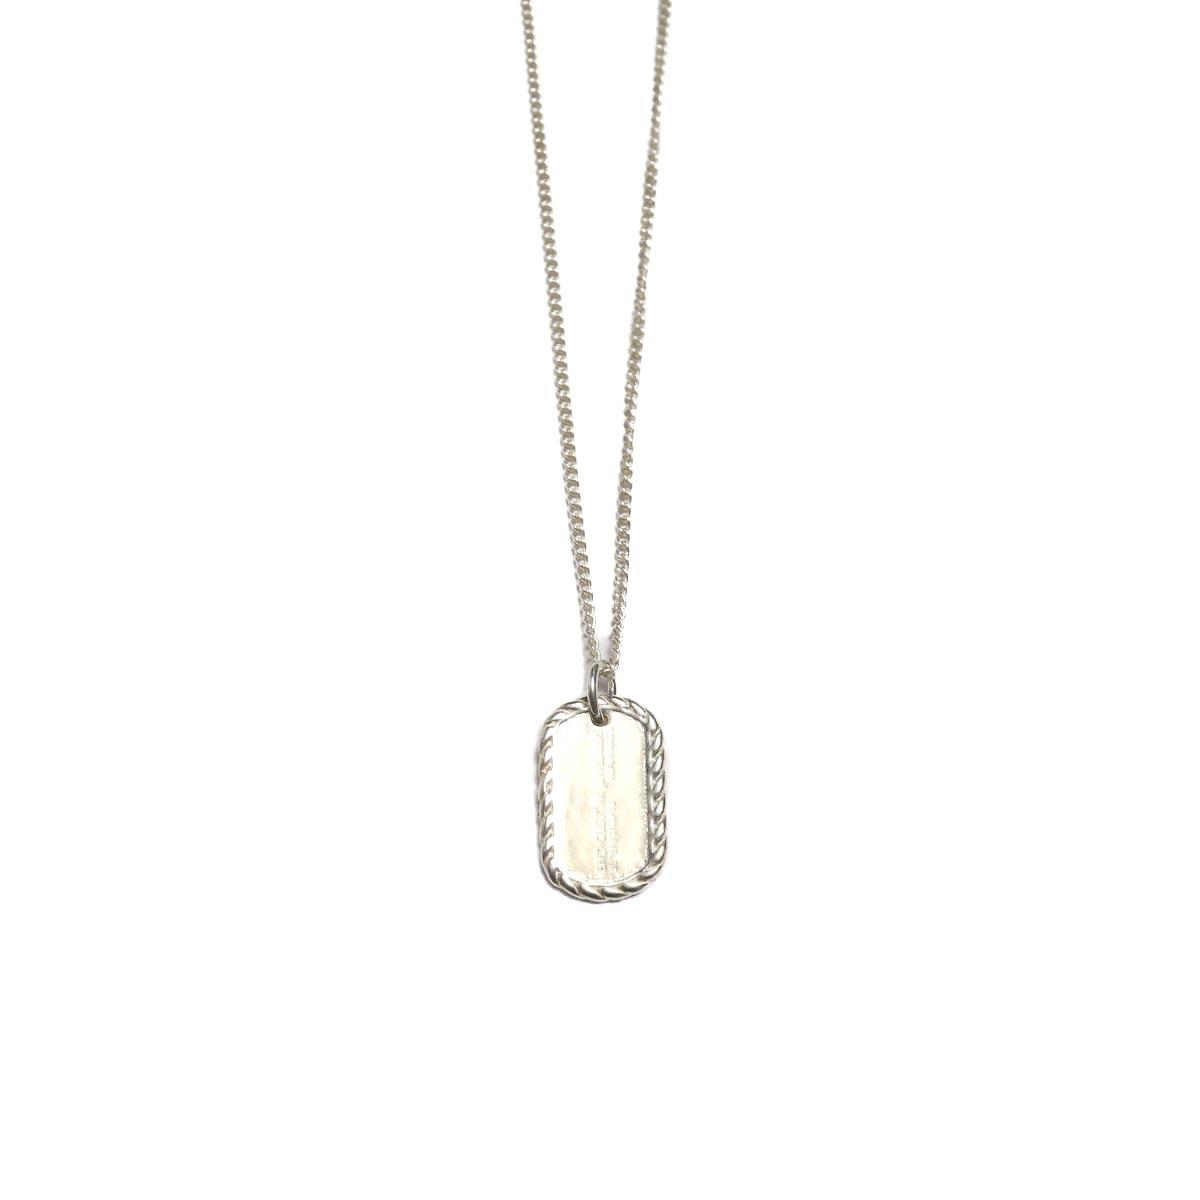 END / Miniature Dogtag Necklace